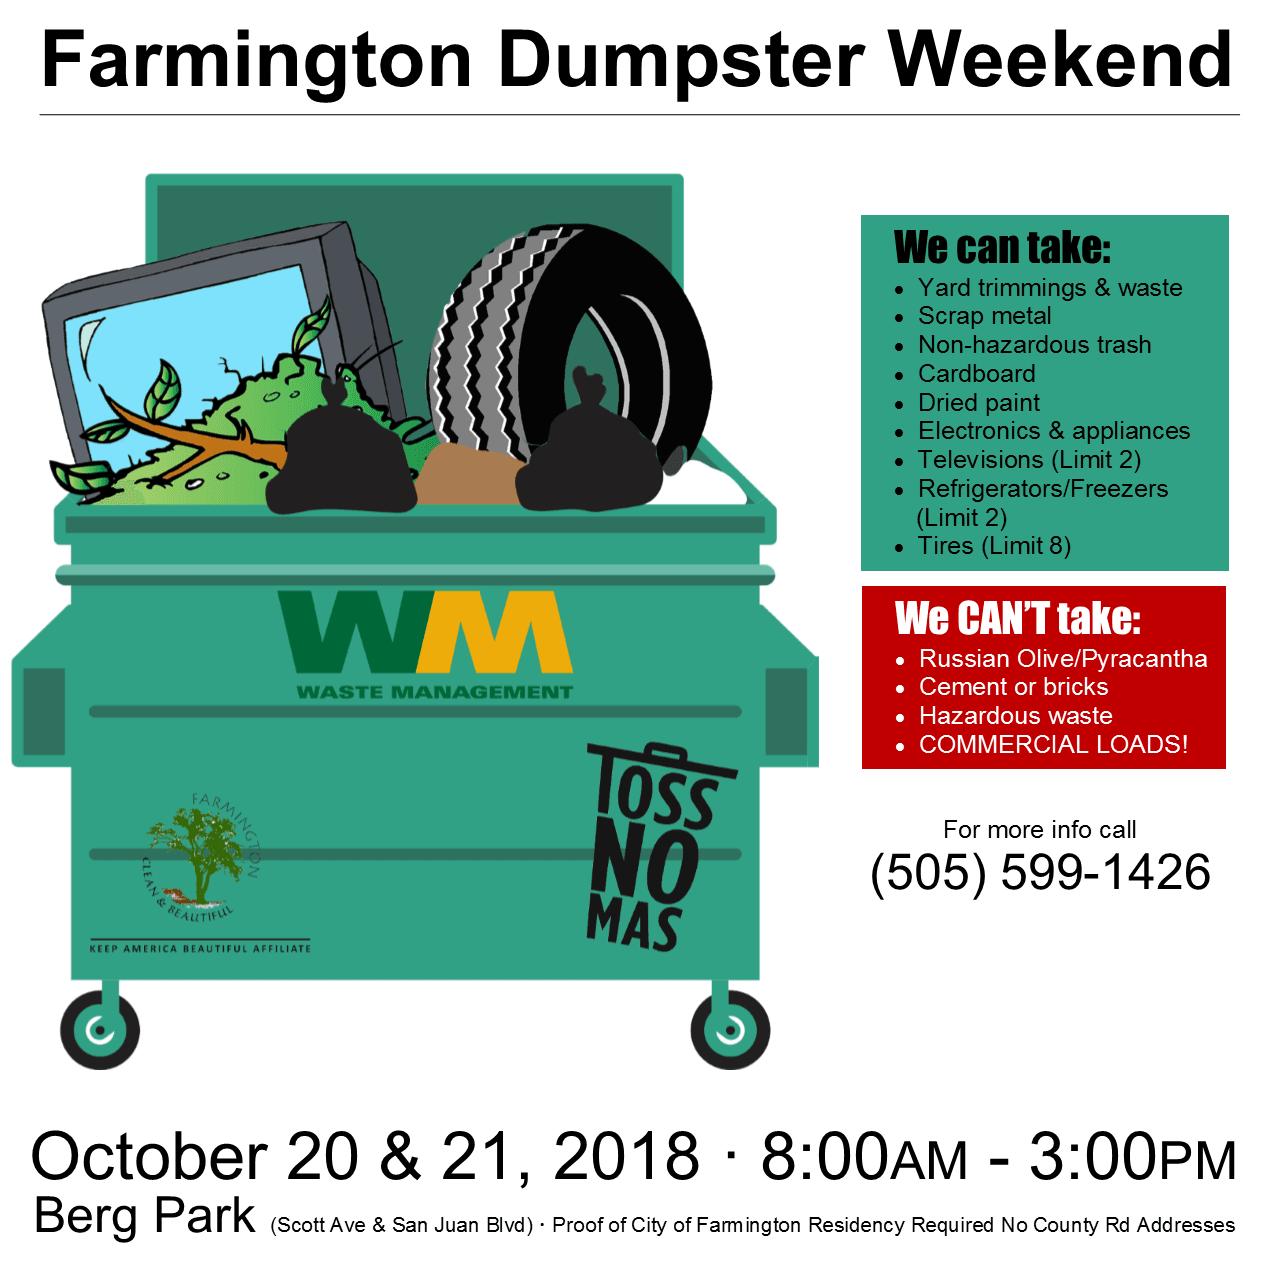 Dumpster Flyer